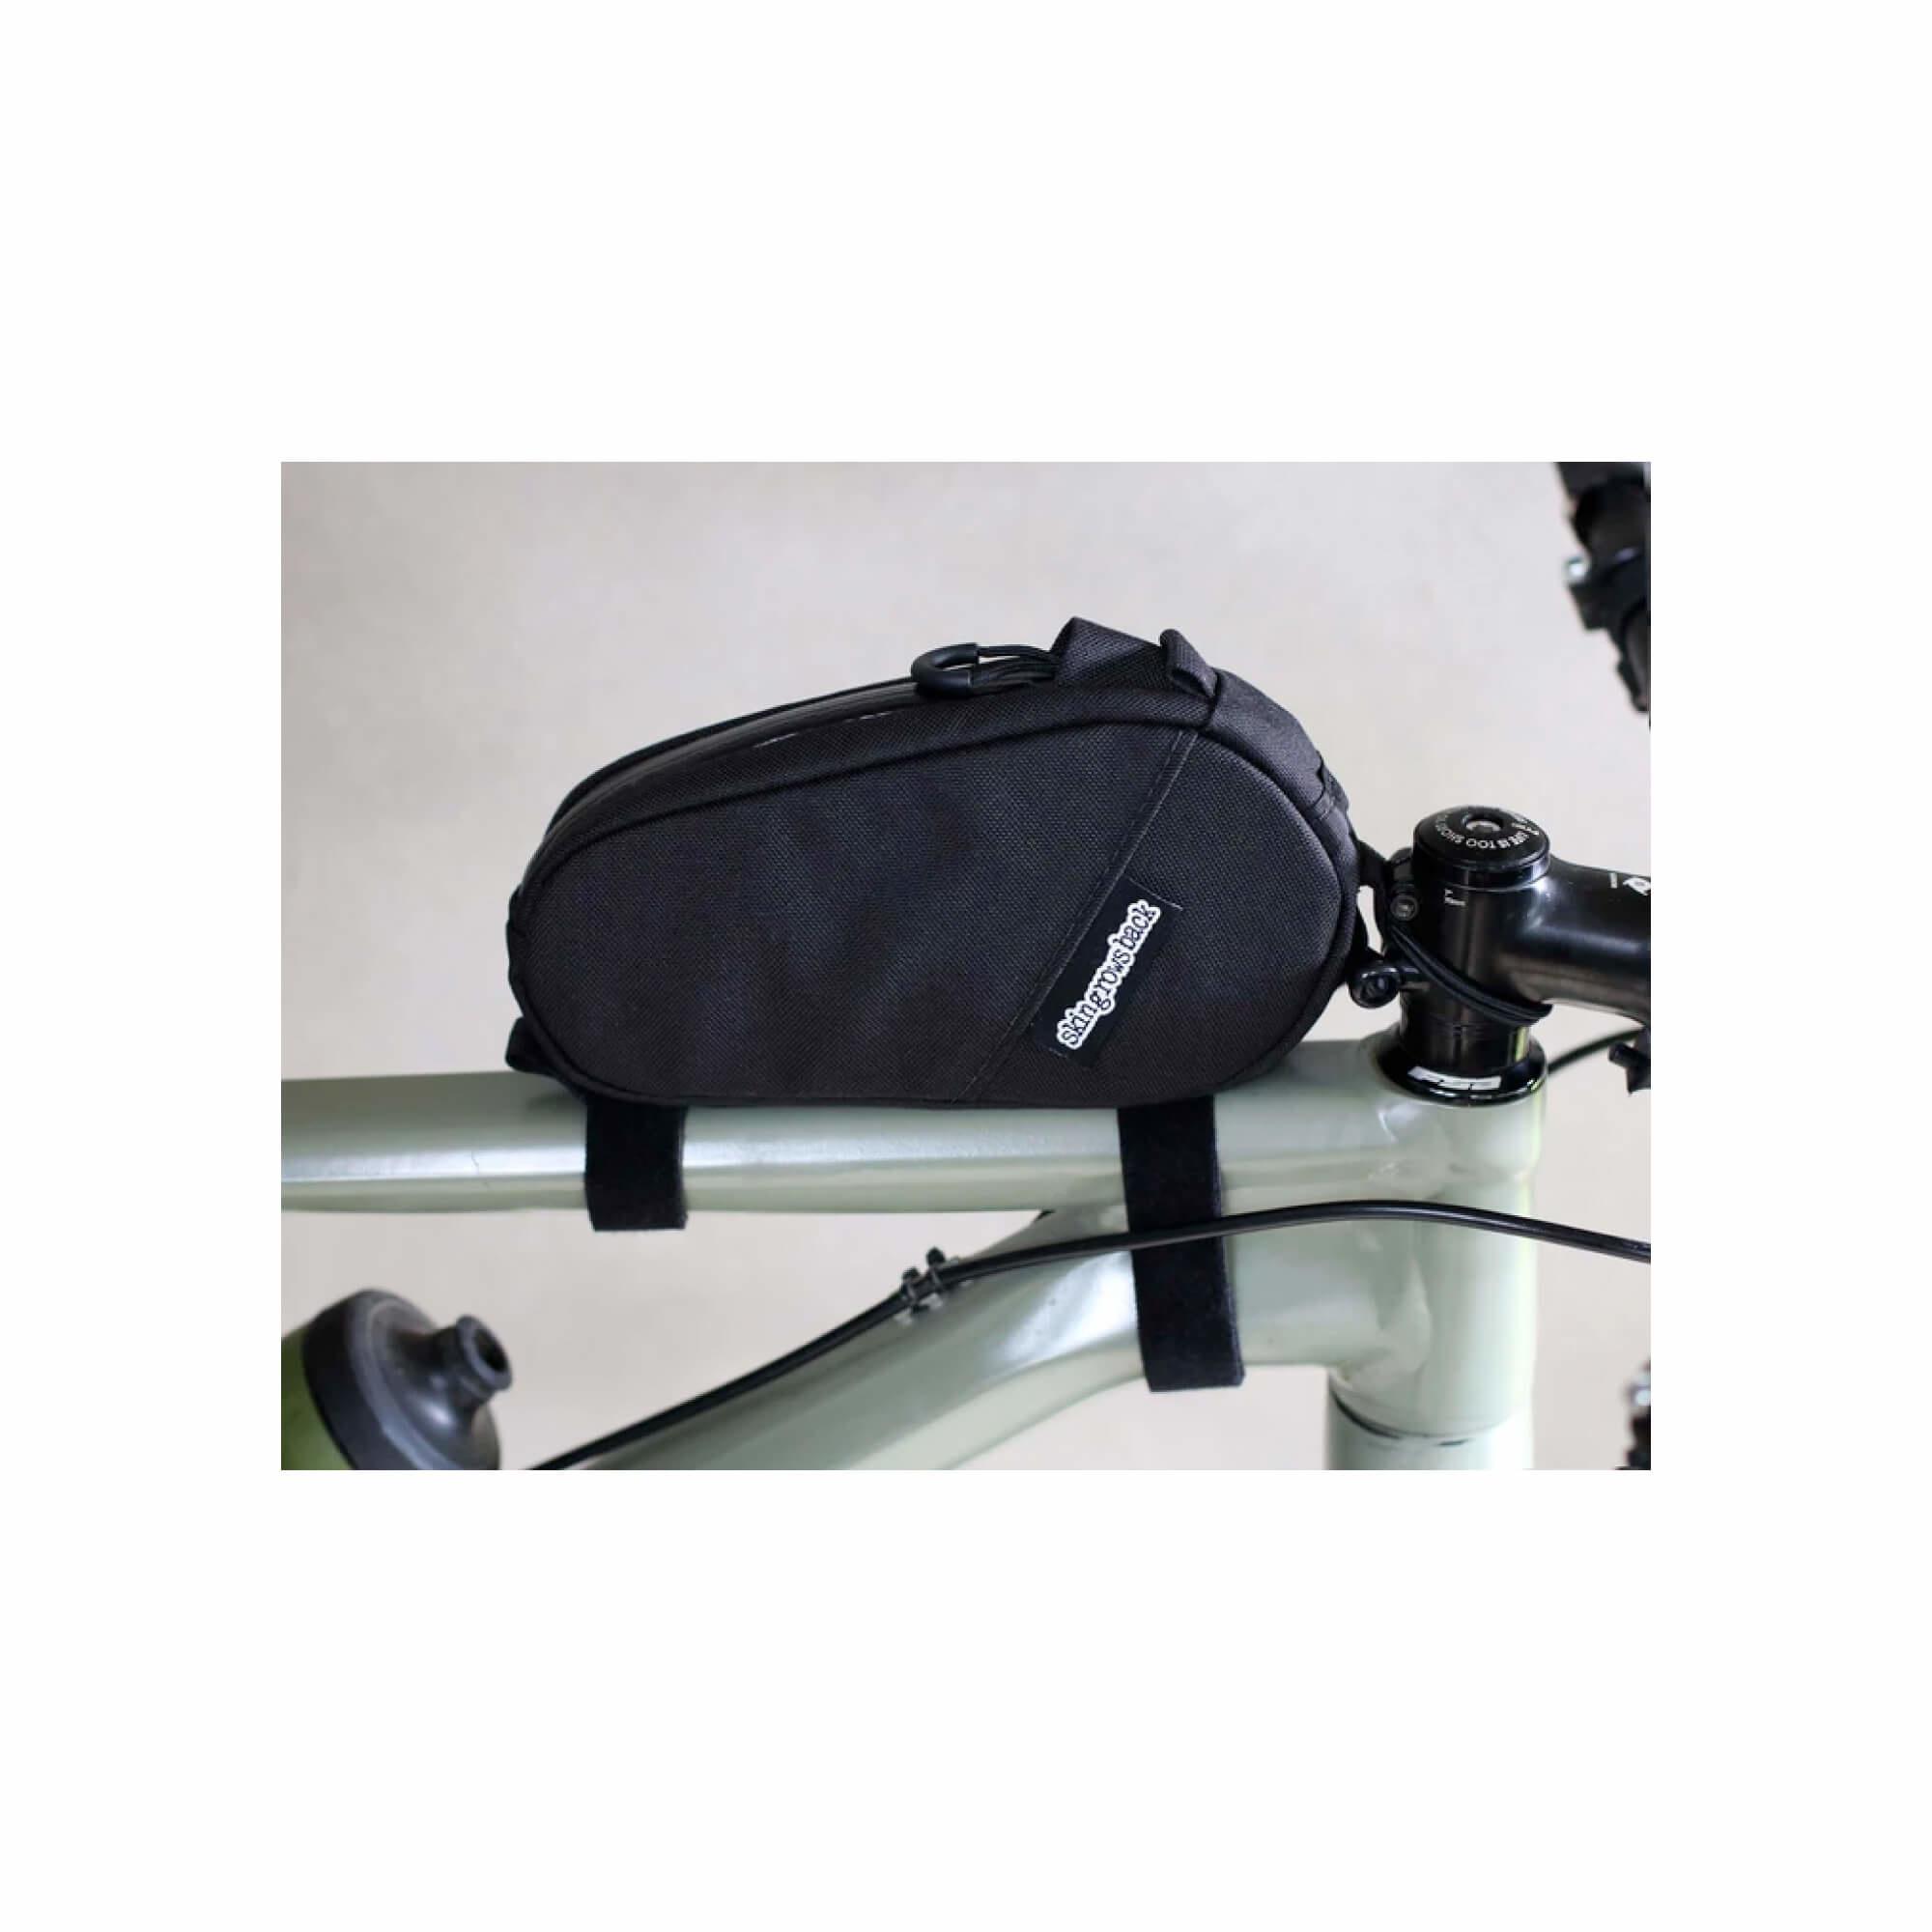 Amigo Top Tube Bag Black-11